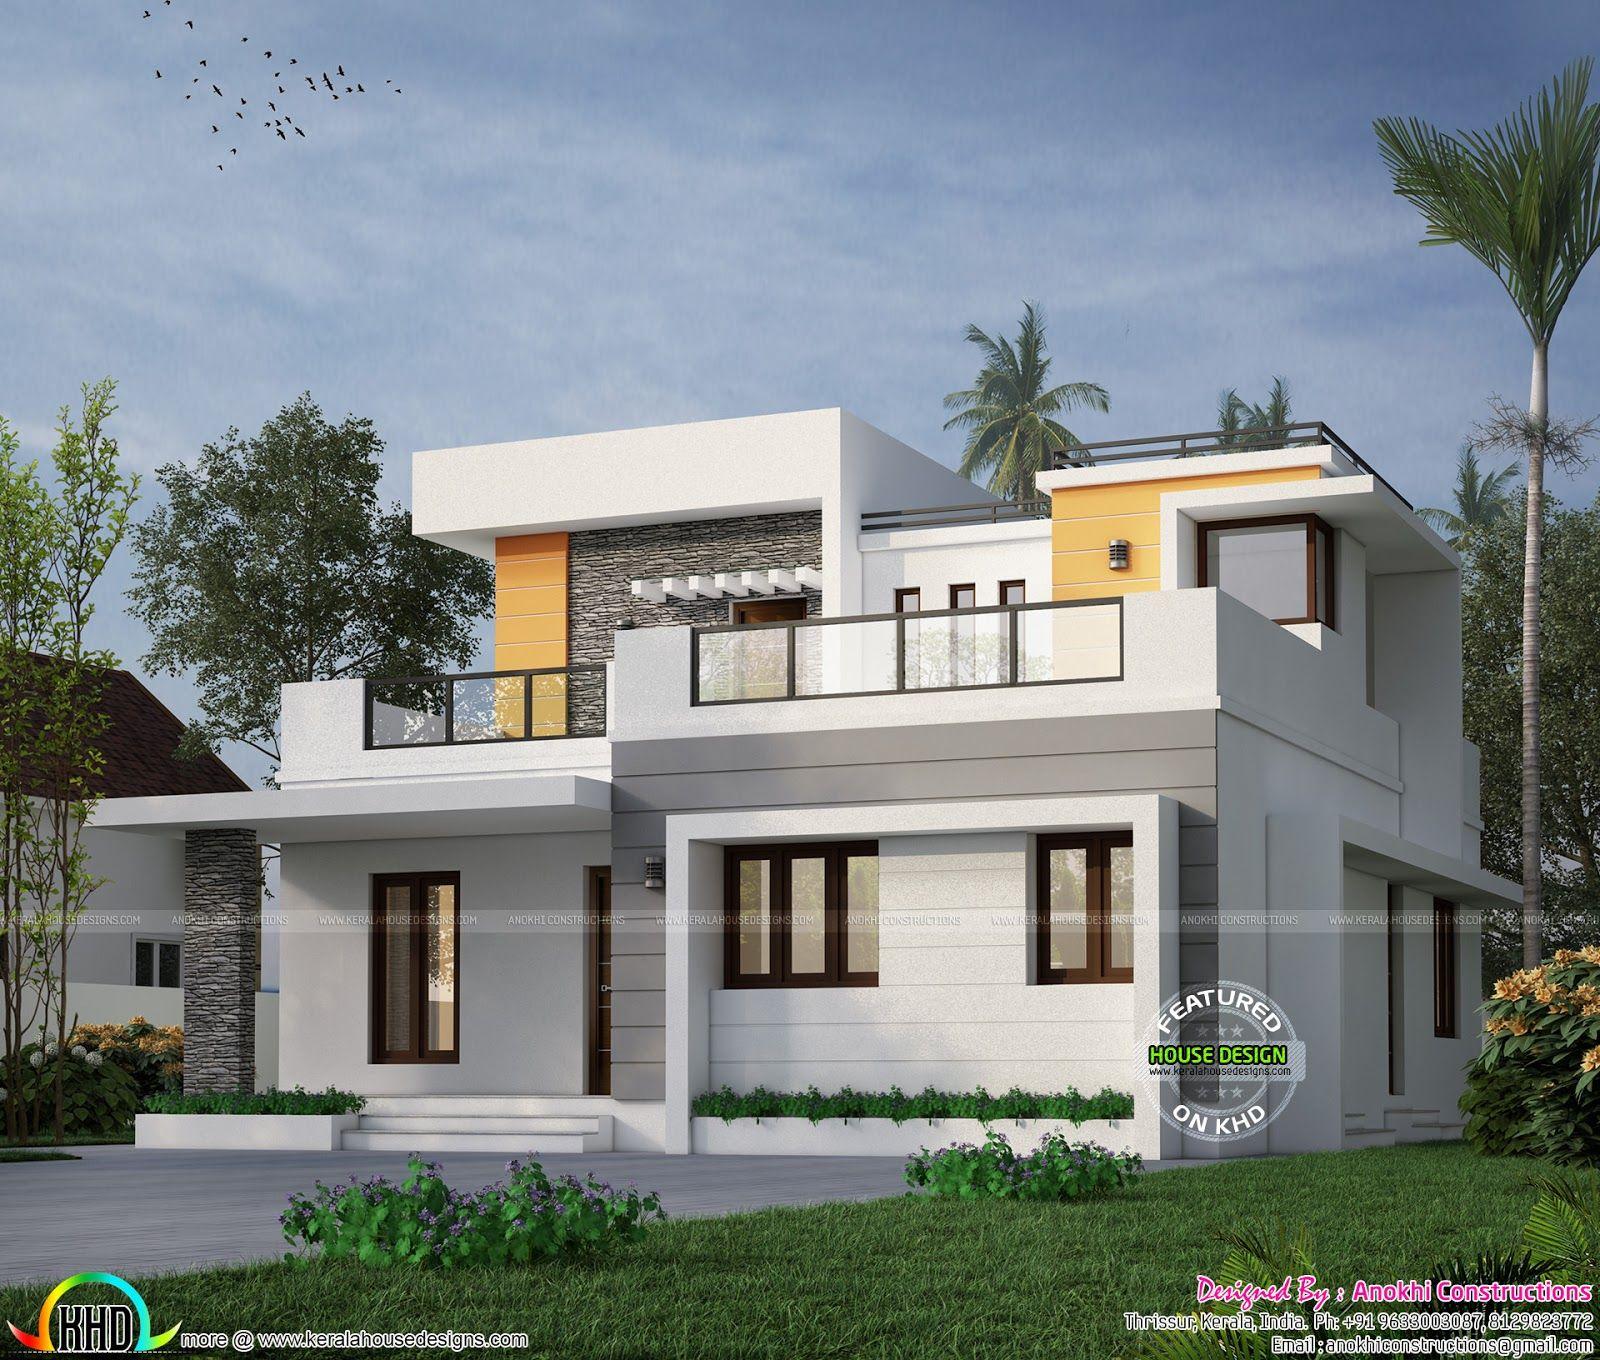 House Construction For 26 Lakhs Kerala House Design Bungalow House Design Modern Style House Plans